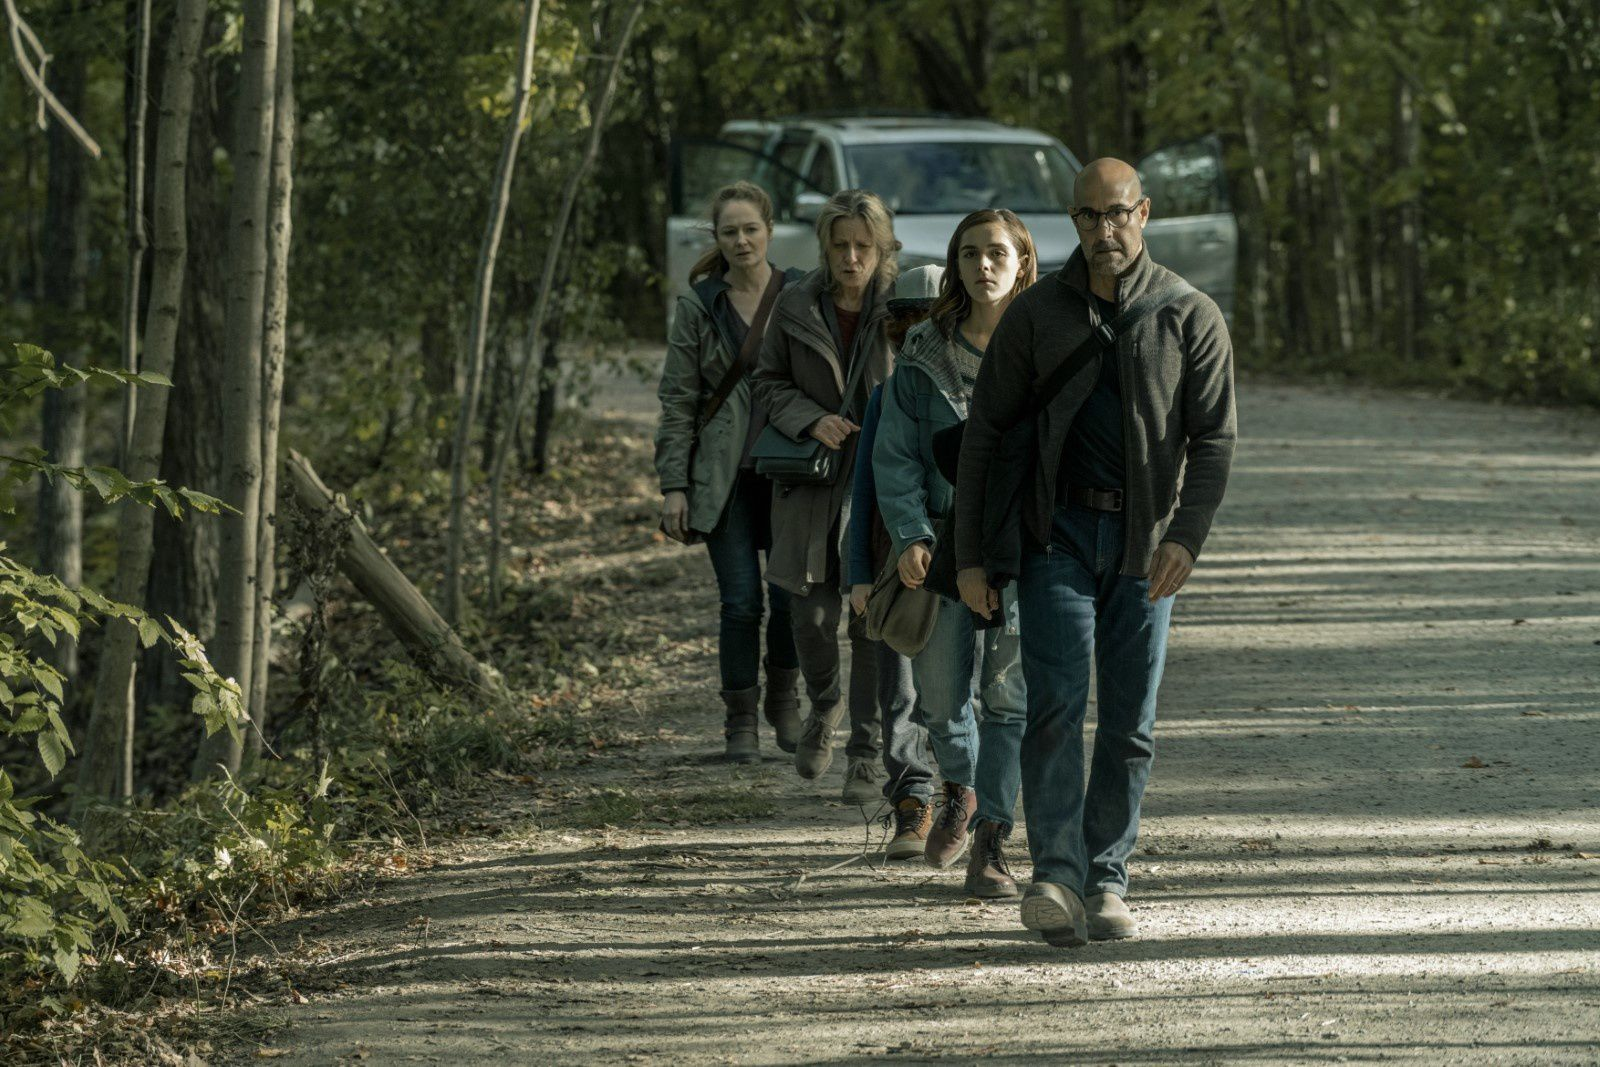 The Silence (BANDE-ANNONCE) avec Stanley Tucci, Kiernan Shipka - Le 12 avril 2019 sur Netflix